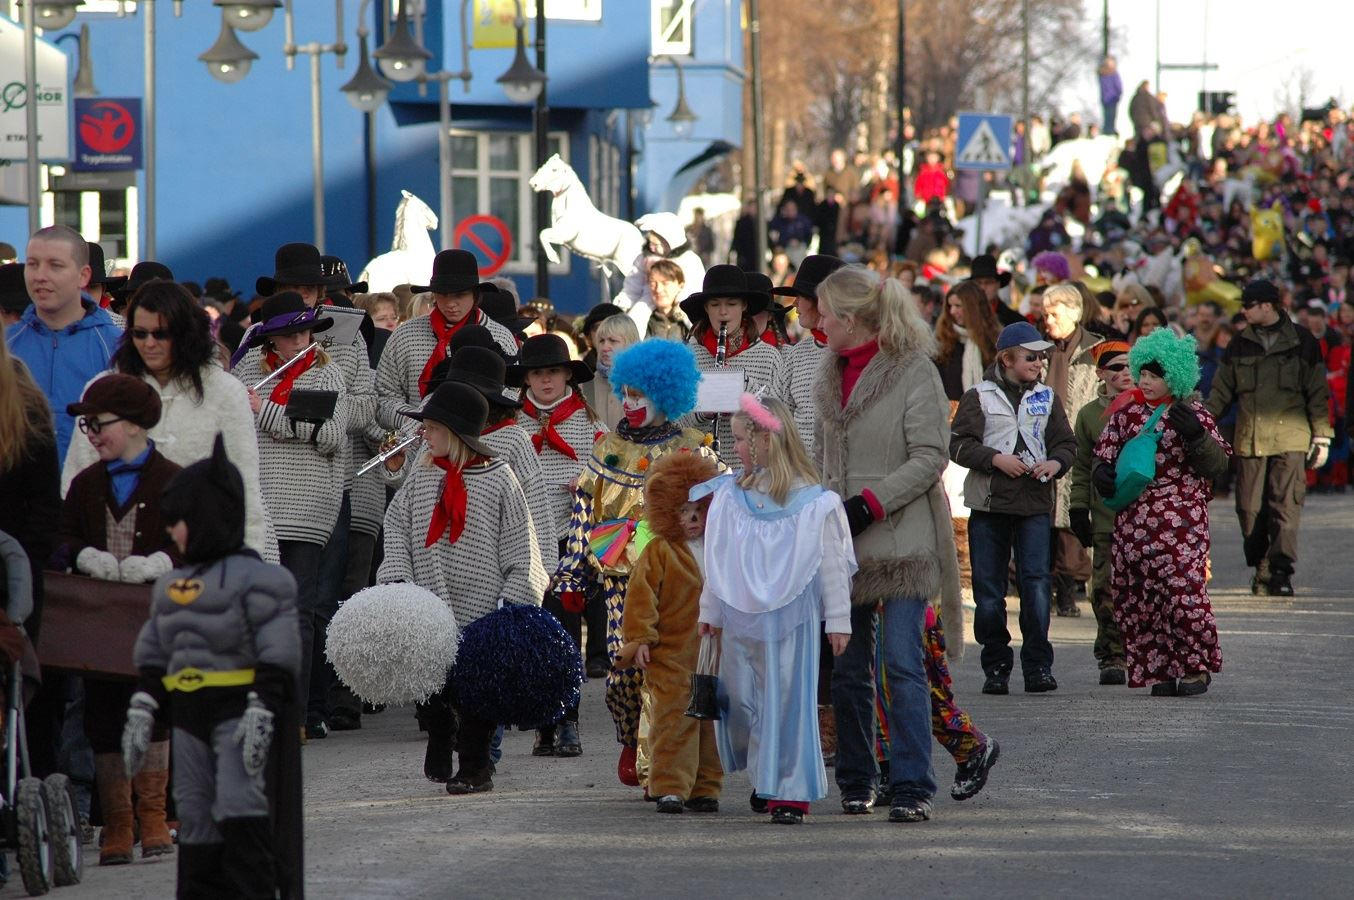 H.Harnang,  © H.Harnang, Barnetoget Vinterfestuka